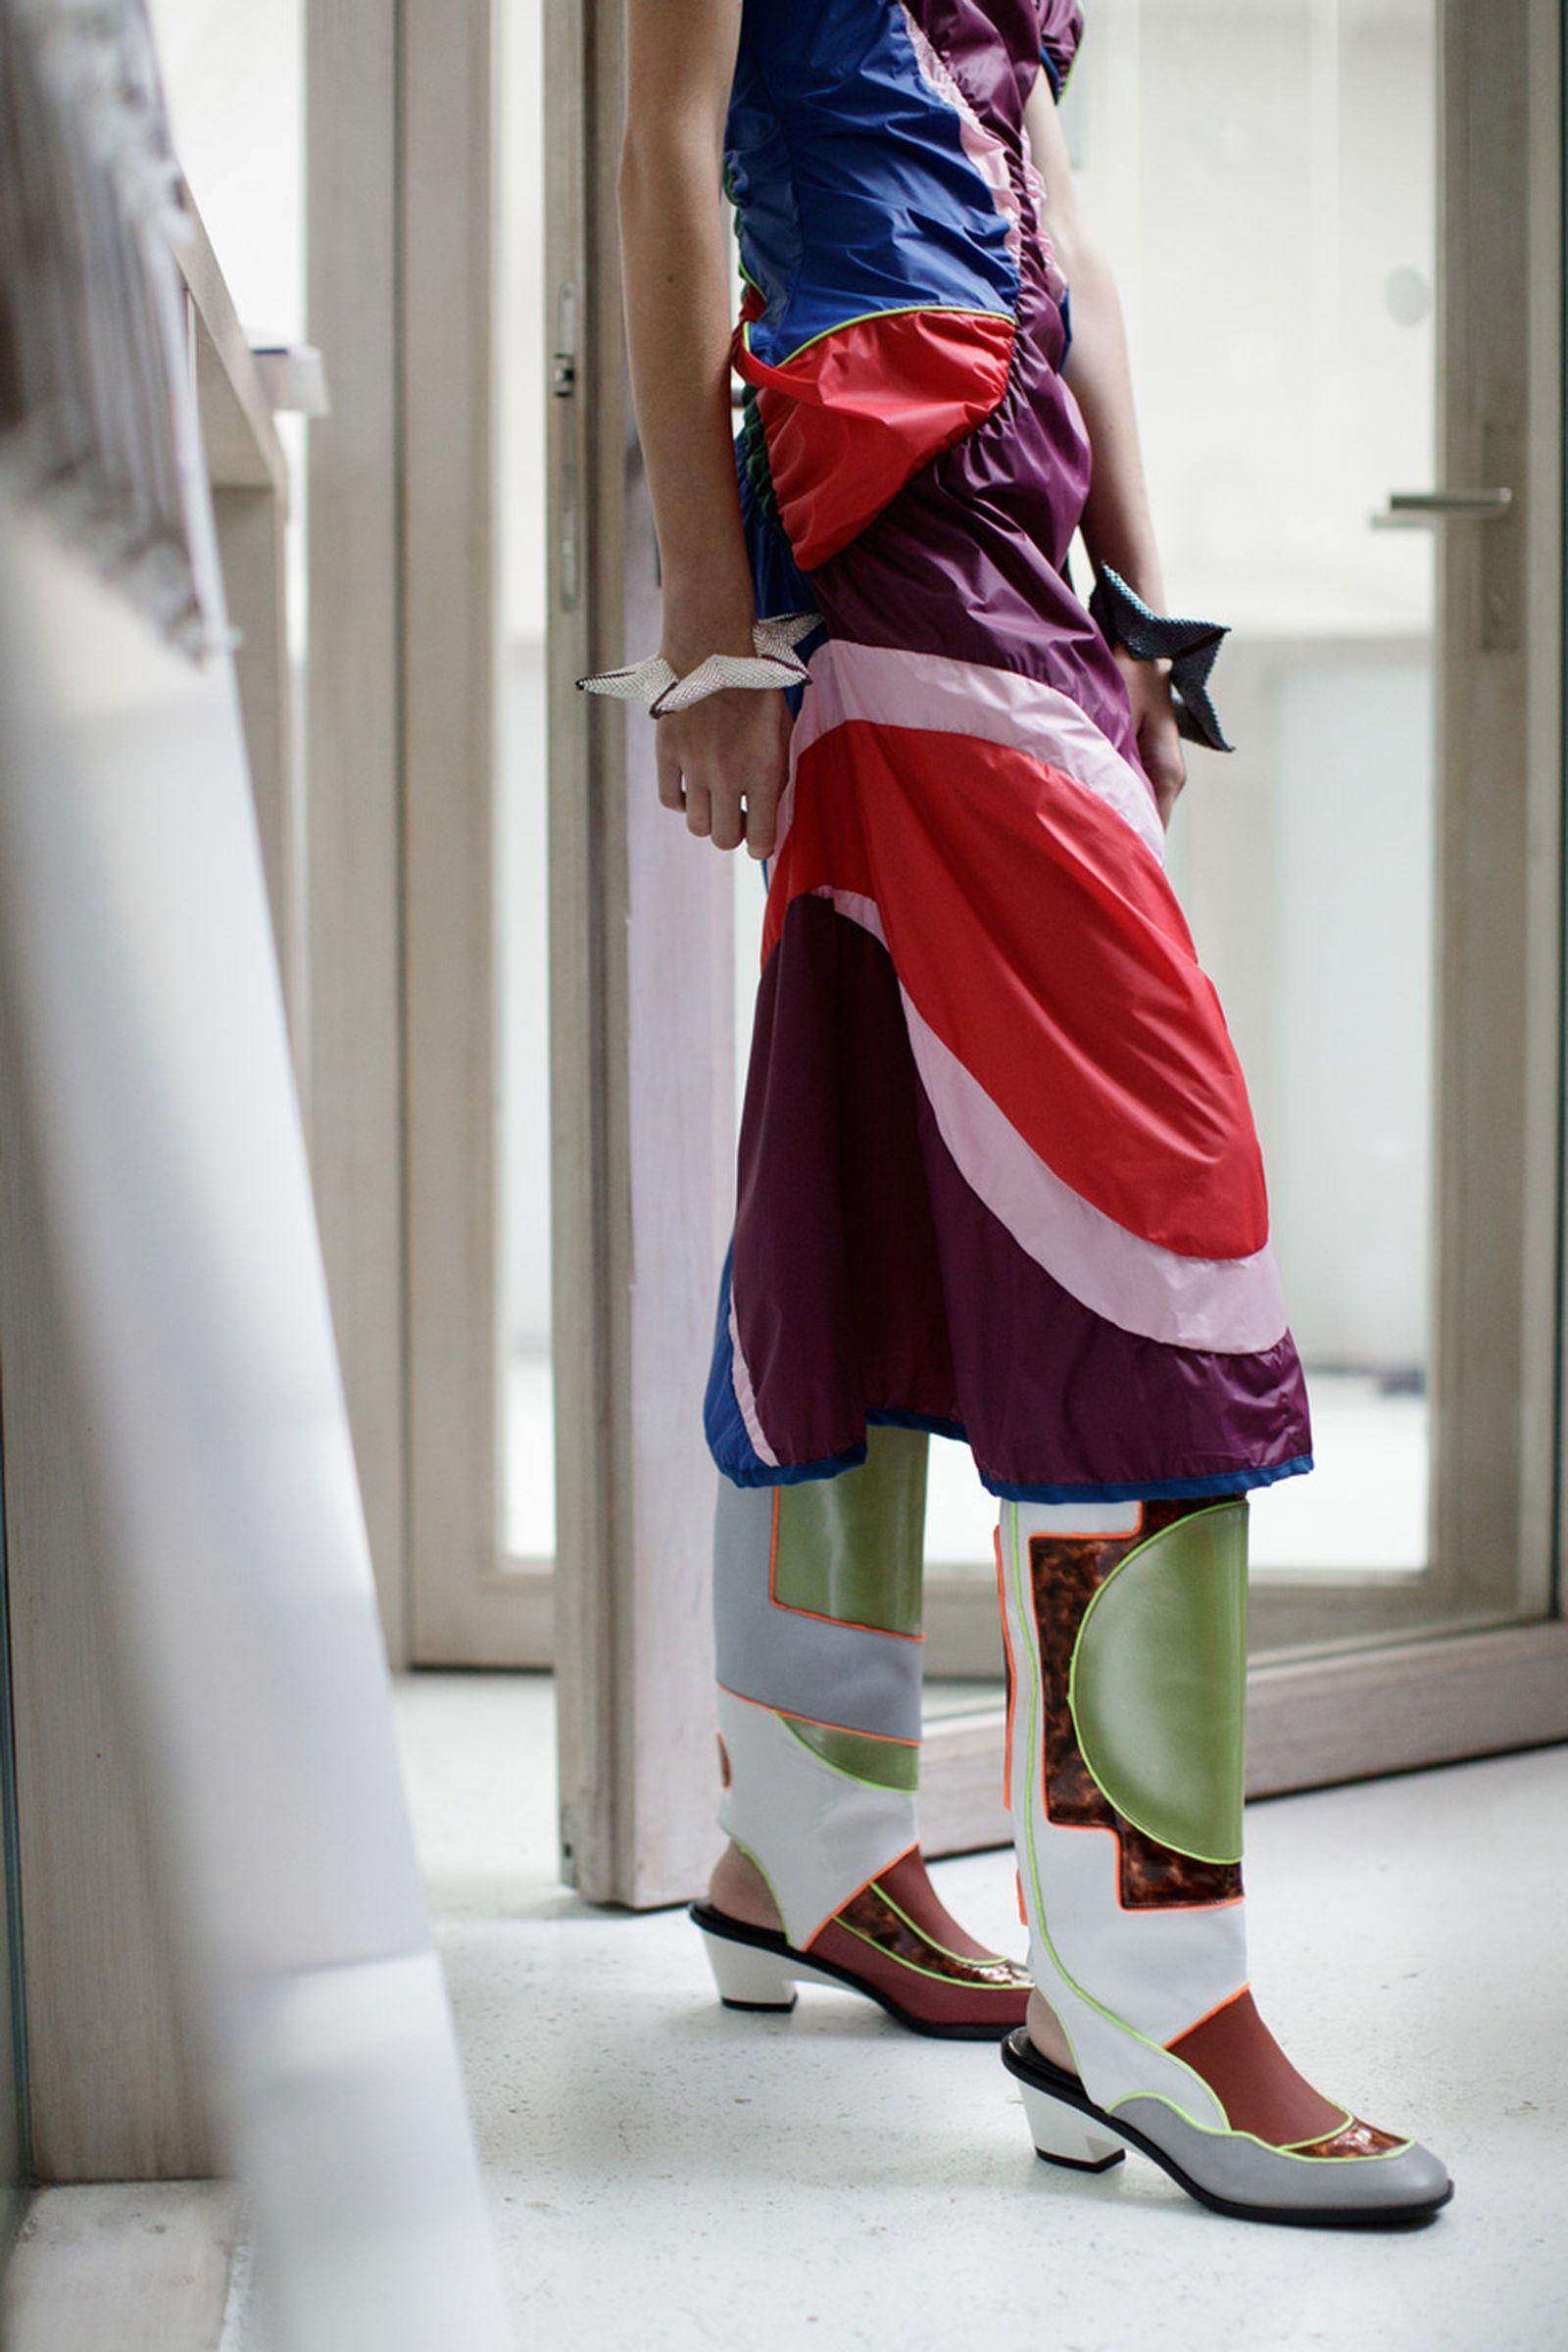 kiko kostadinov london fashion week5